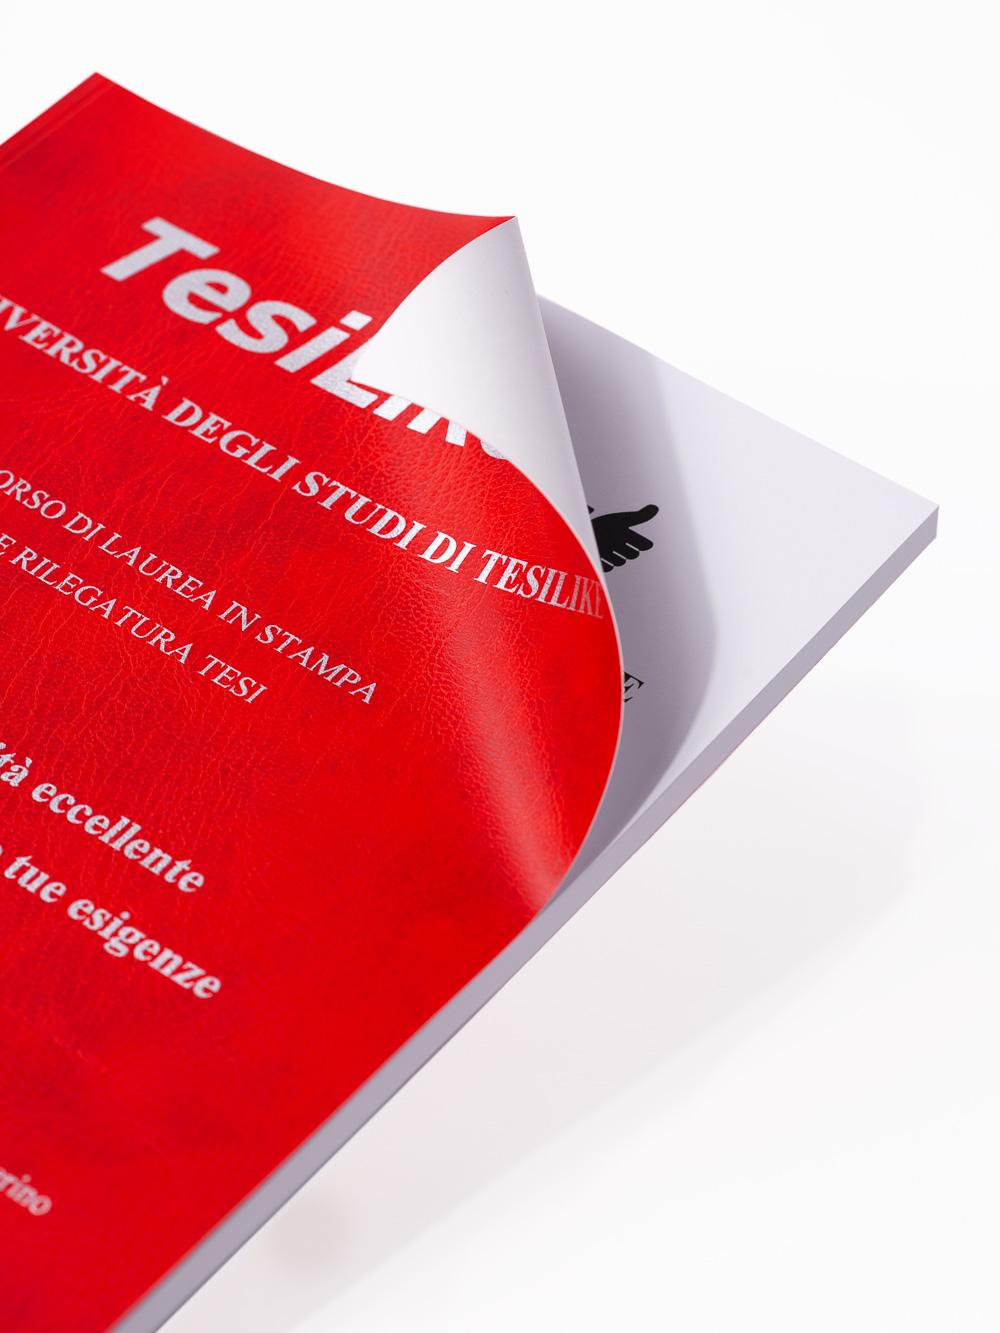 copertina-tesi-flessibile-rossa-frontespizio-argento-dettaglio3-tesilike